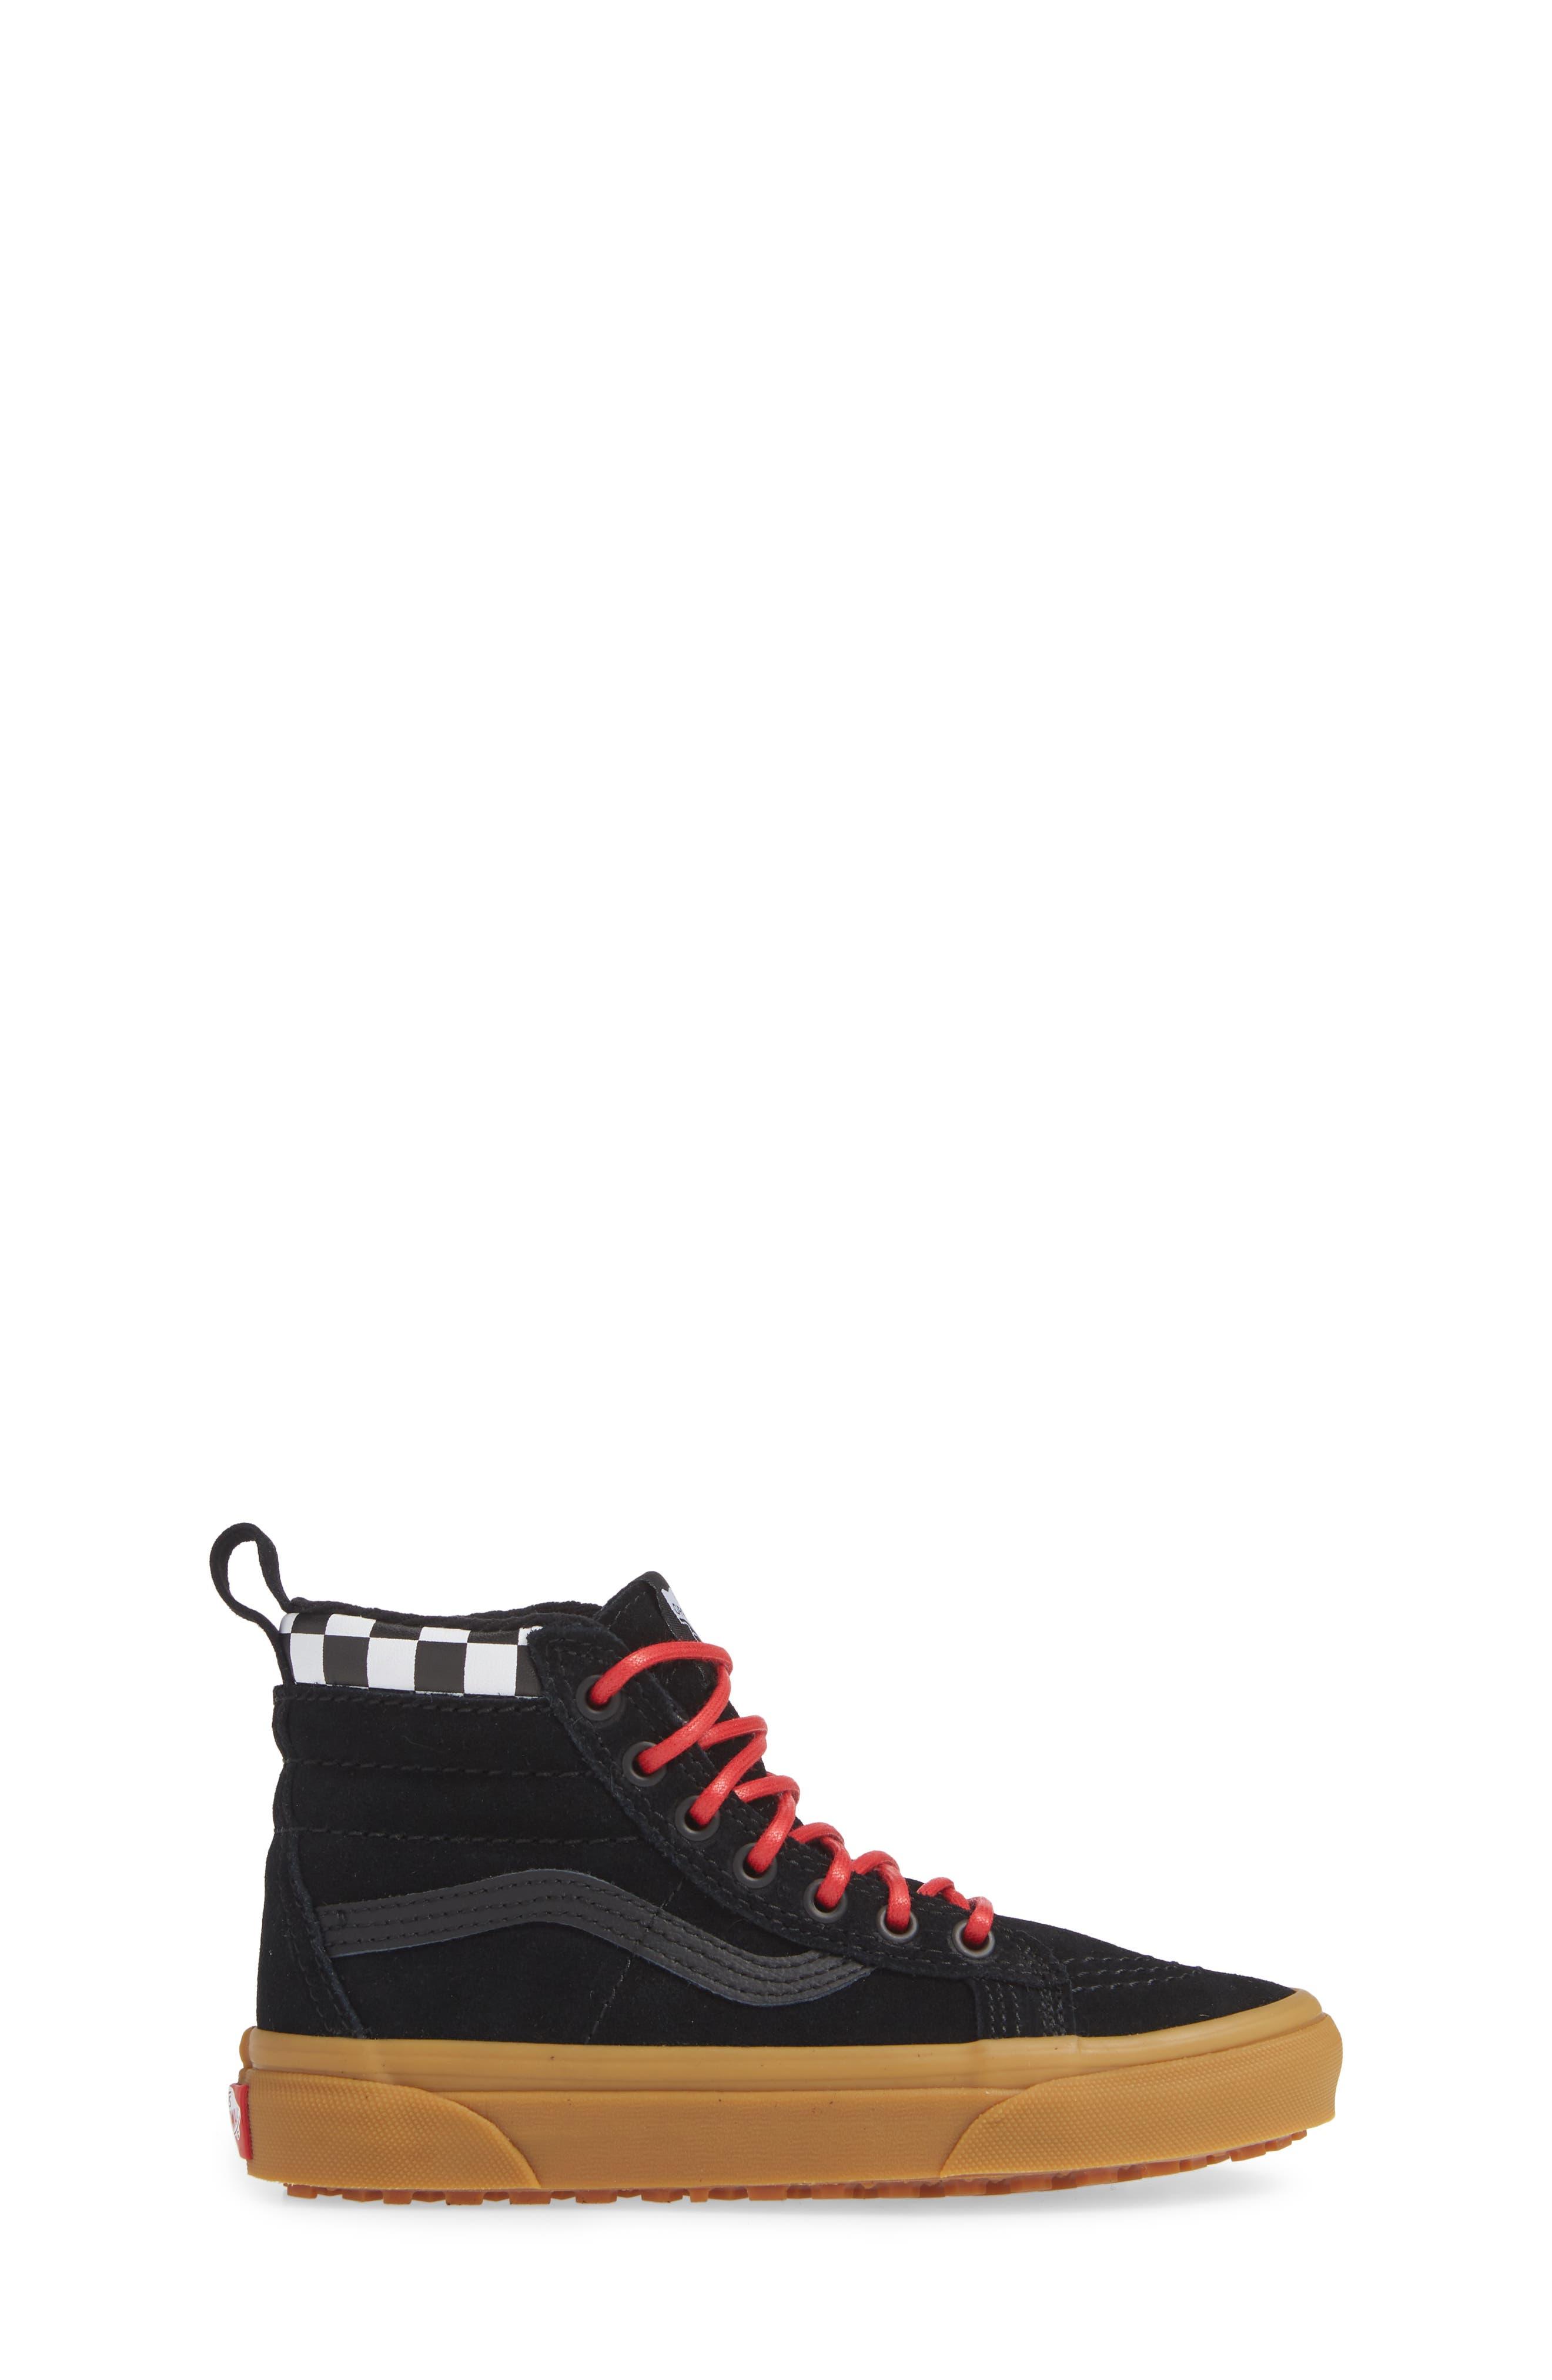 SK8-Hi Sneaker,                             Alternate thumbnail 3, color,                             CHECKERBOARD/ BLACK